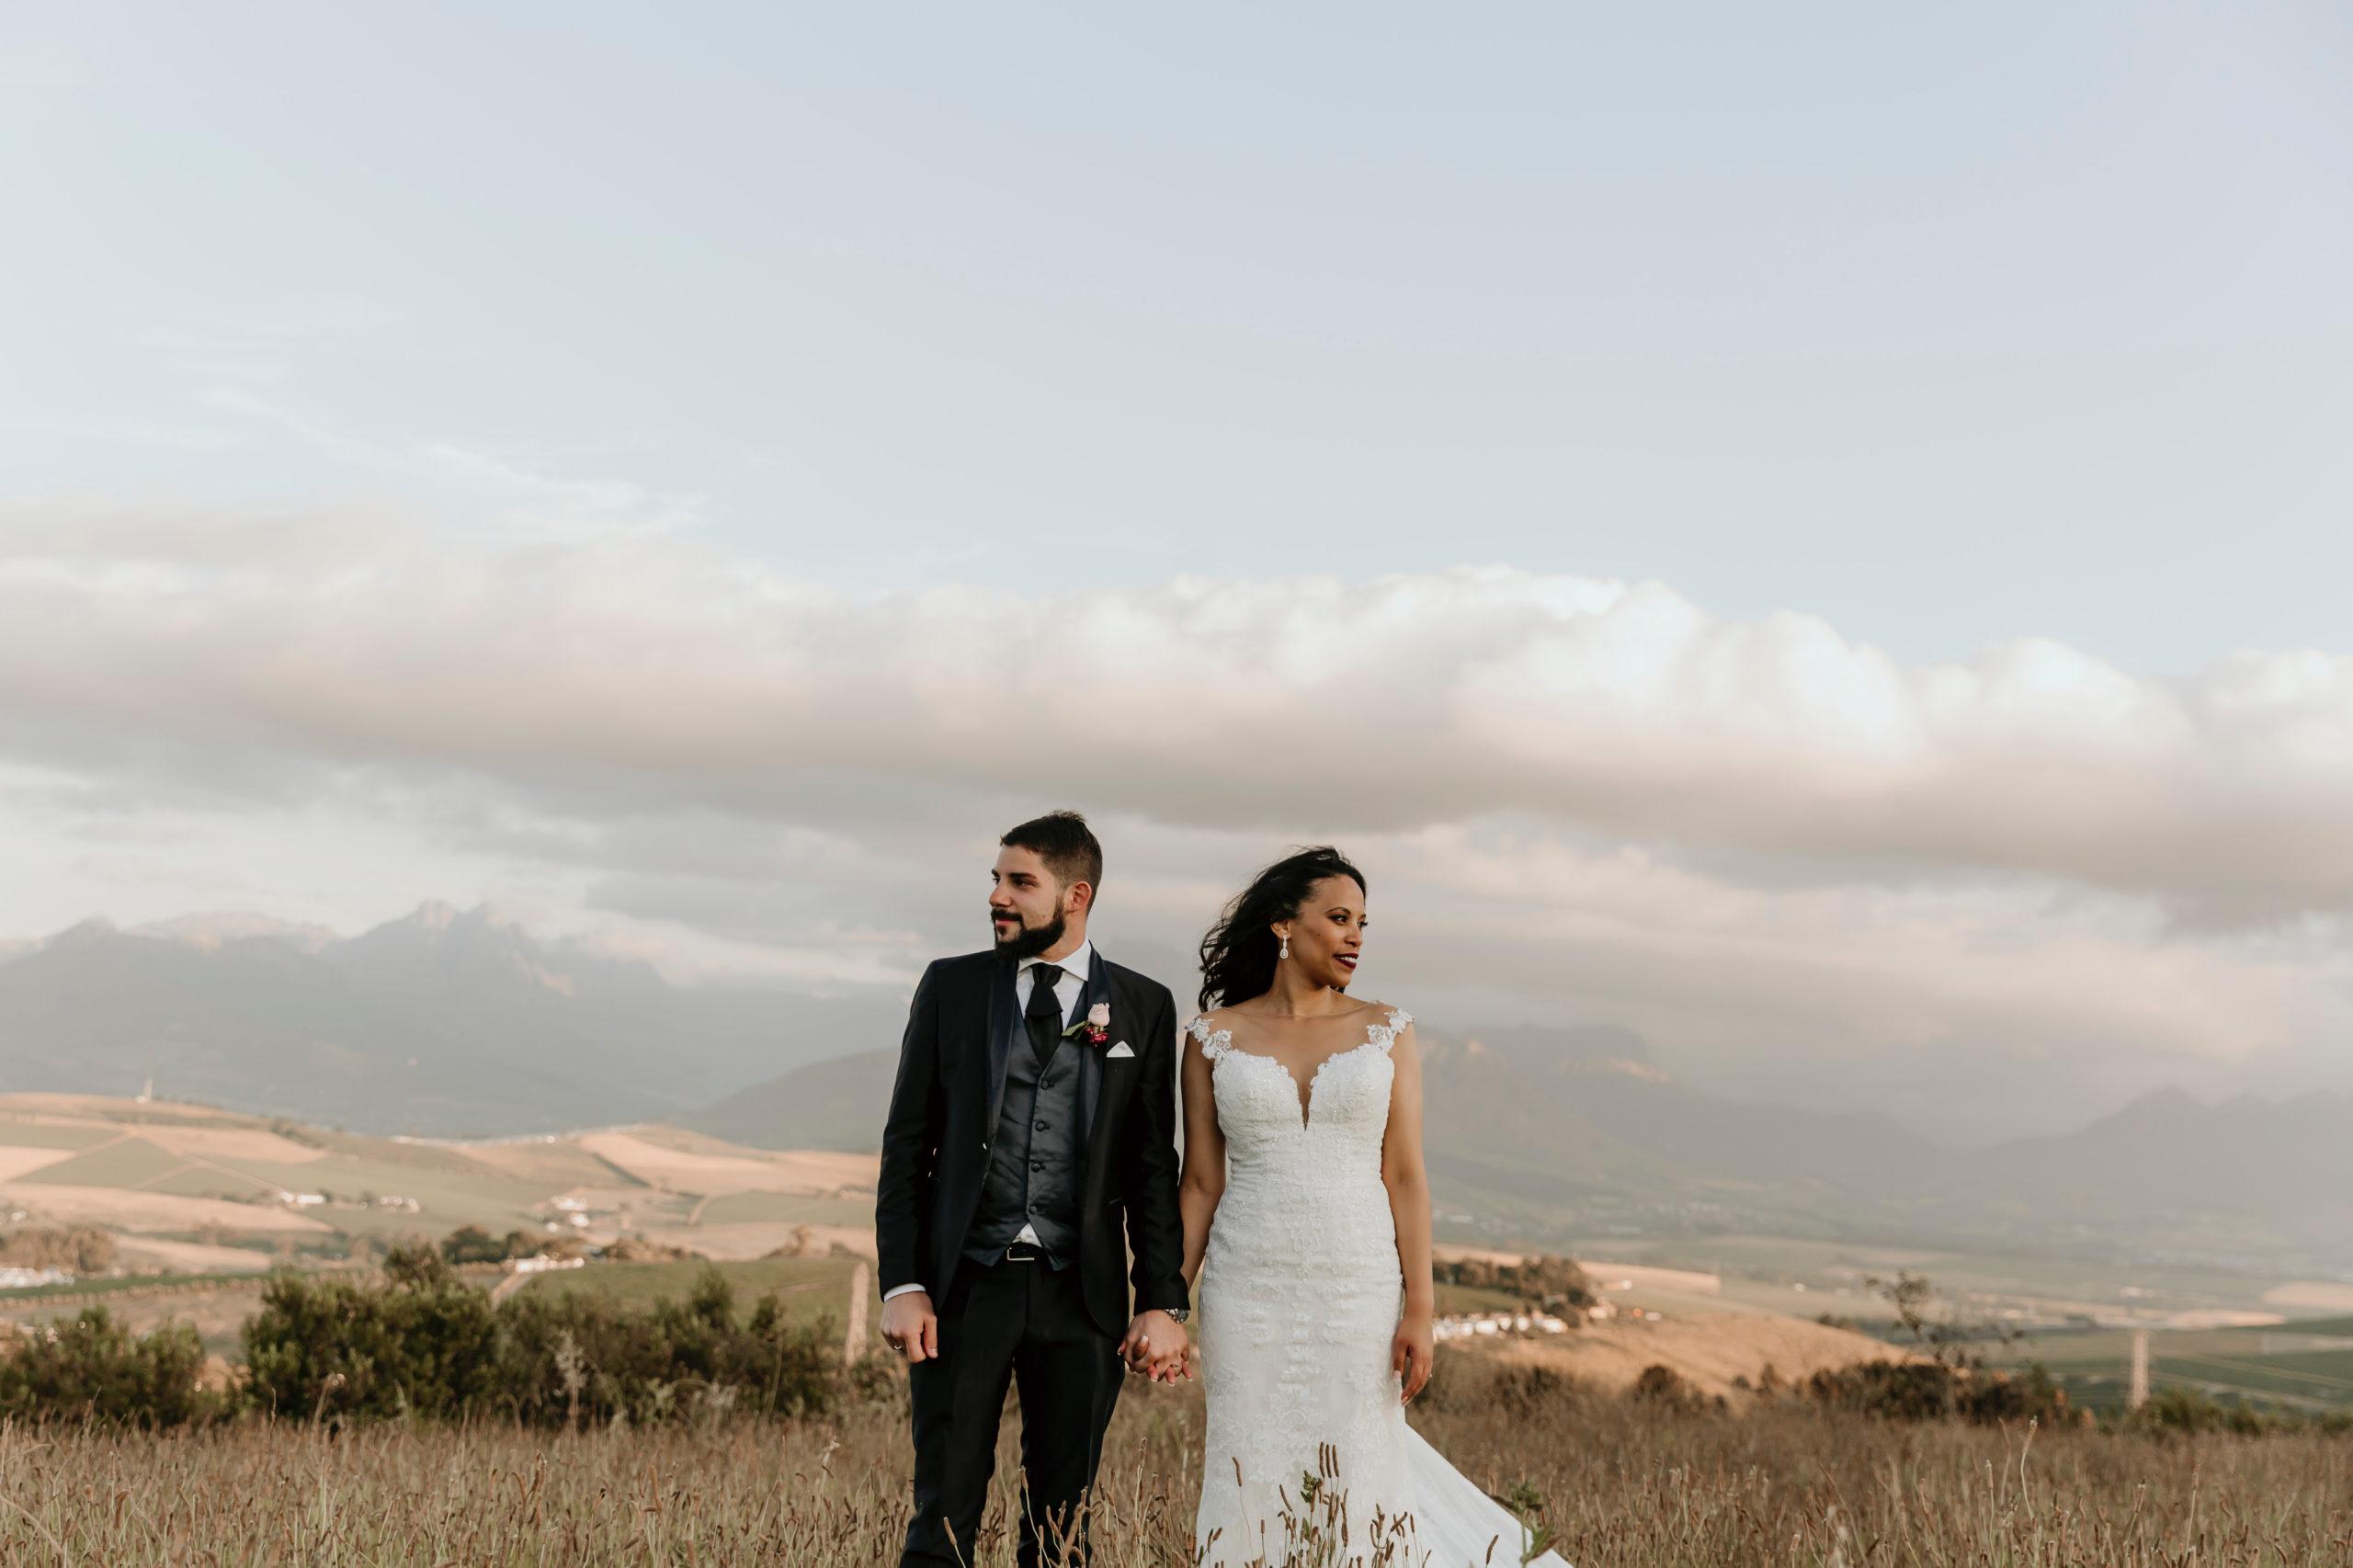 Wedding 6173191C4964